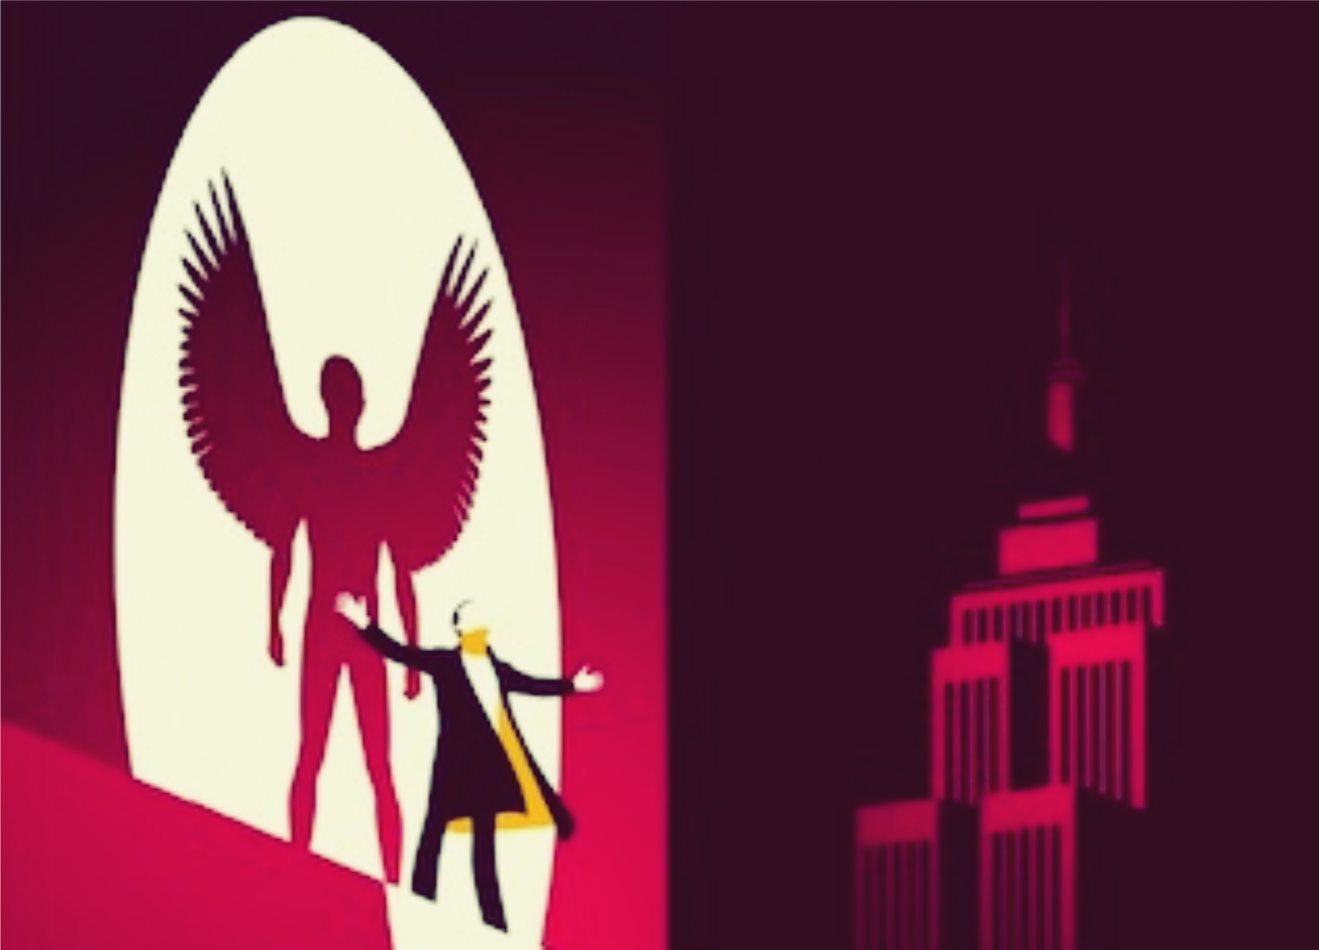 BIRDMAN alternative poster